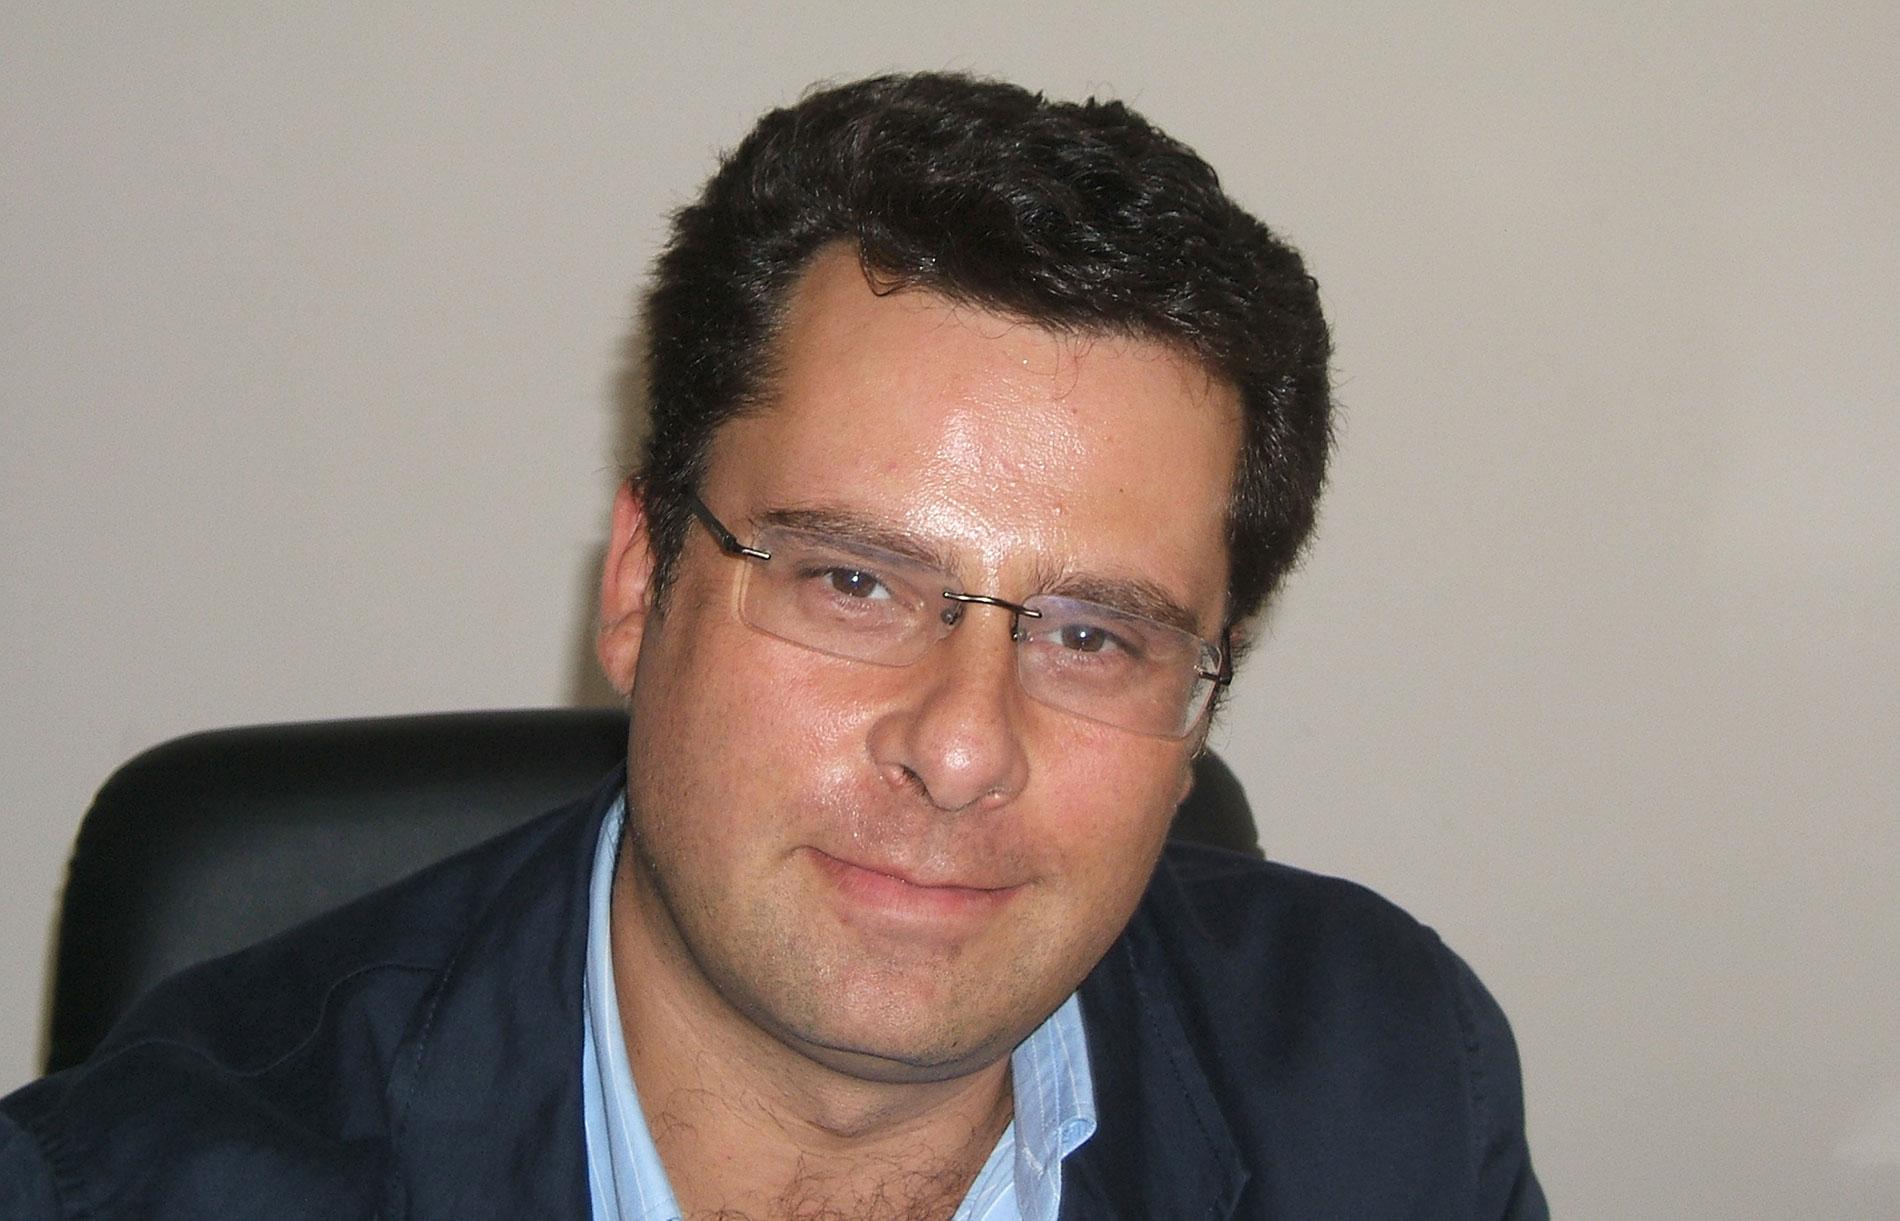 Mario D'Agostino